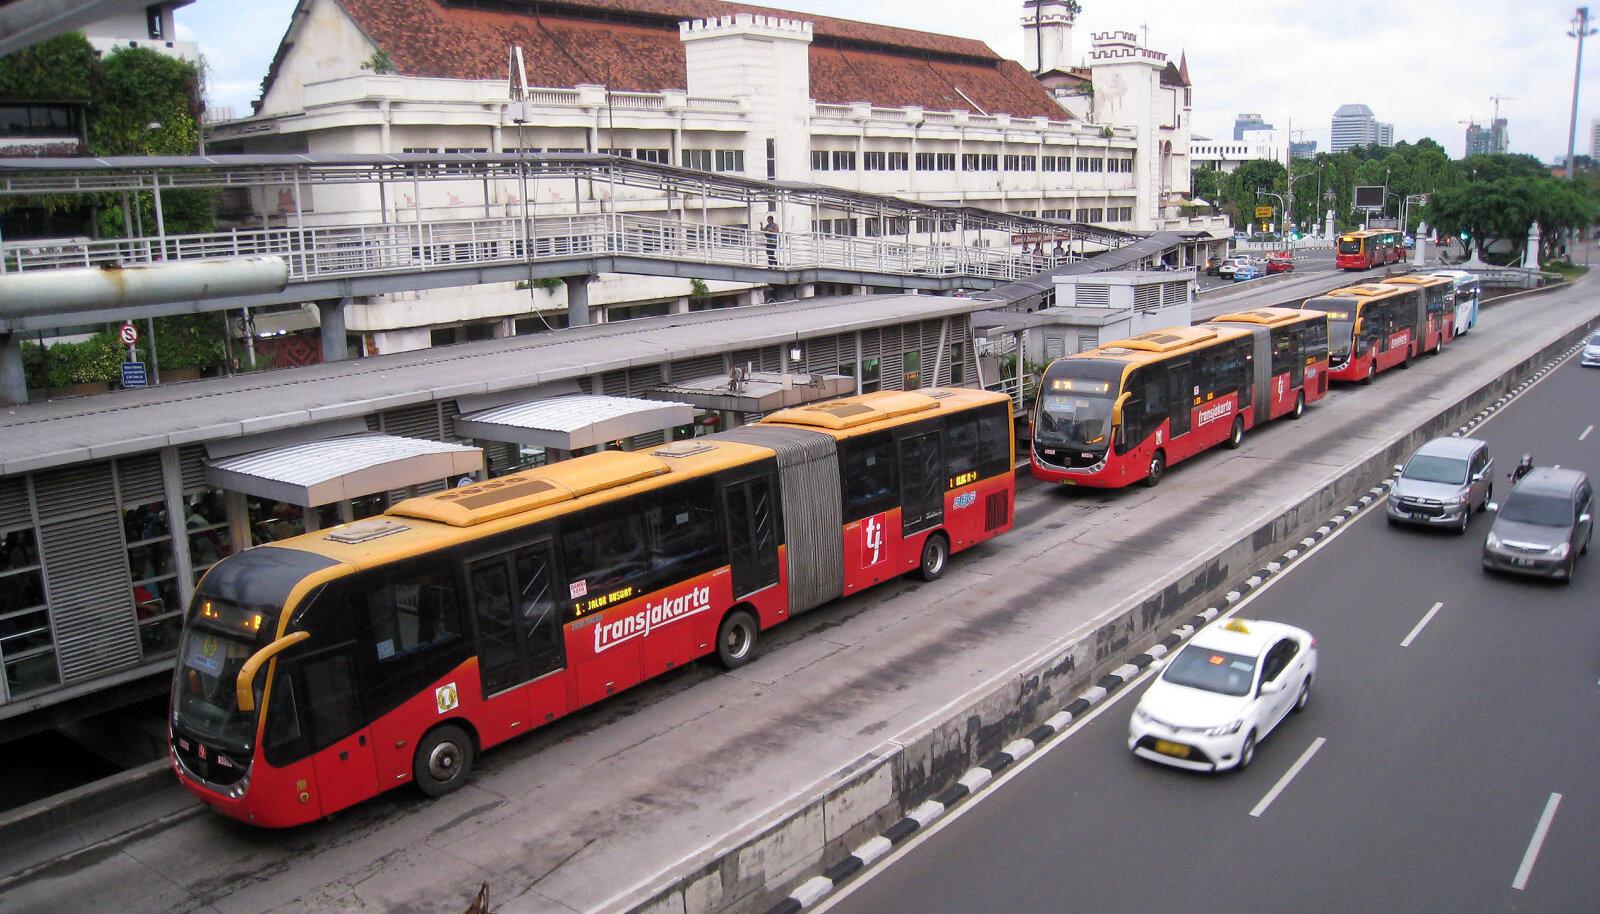 Nn metroobuss Indoneesias Jakartas